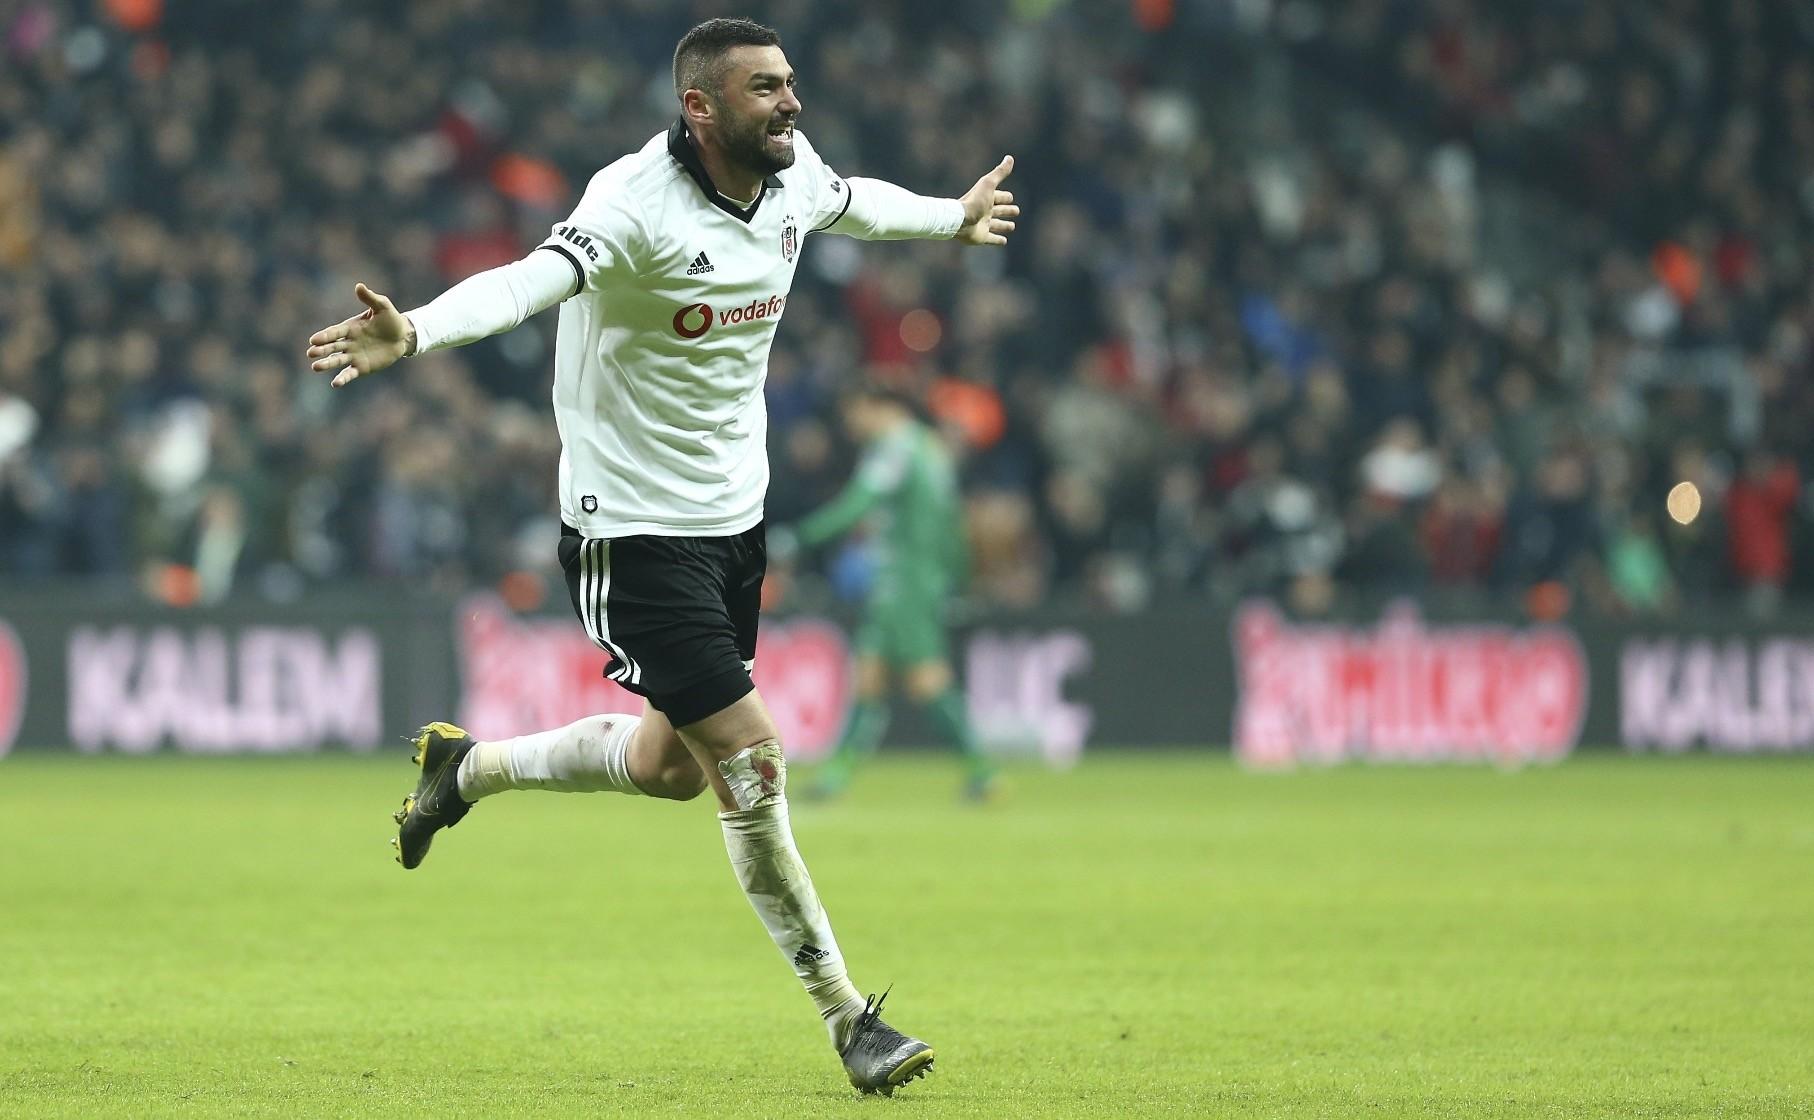 Yu0131lmaz, who joined Beu015fiktau015f in the  January transfer window, scored his first goal for the team against Bursaspor.